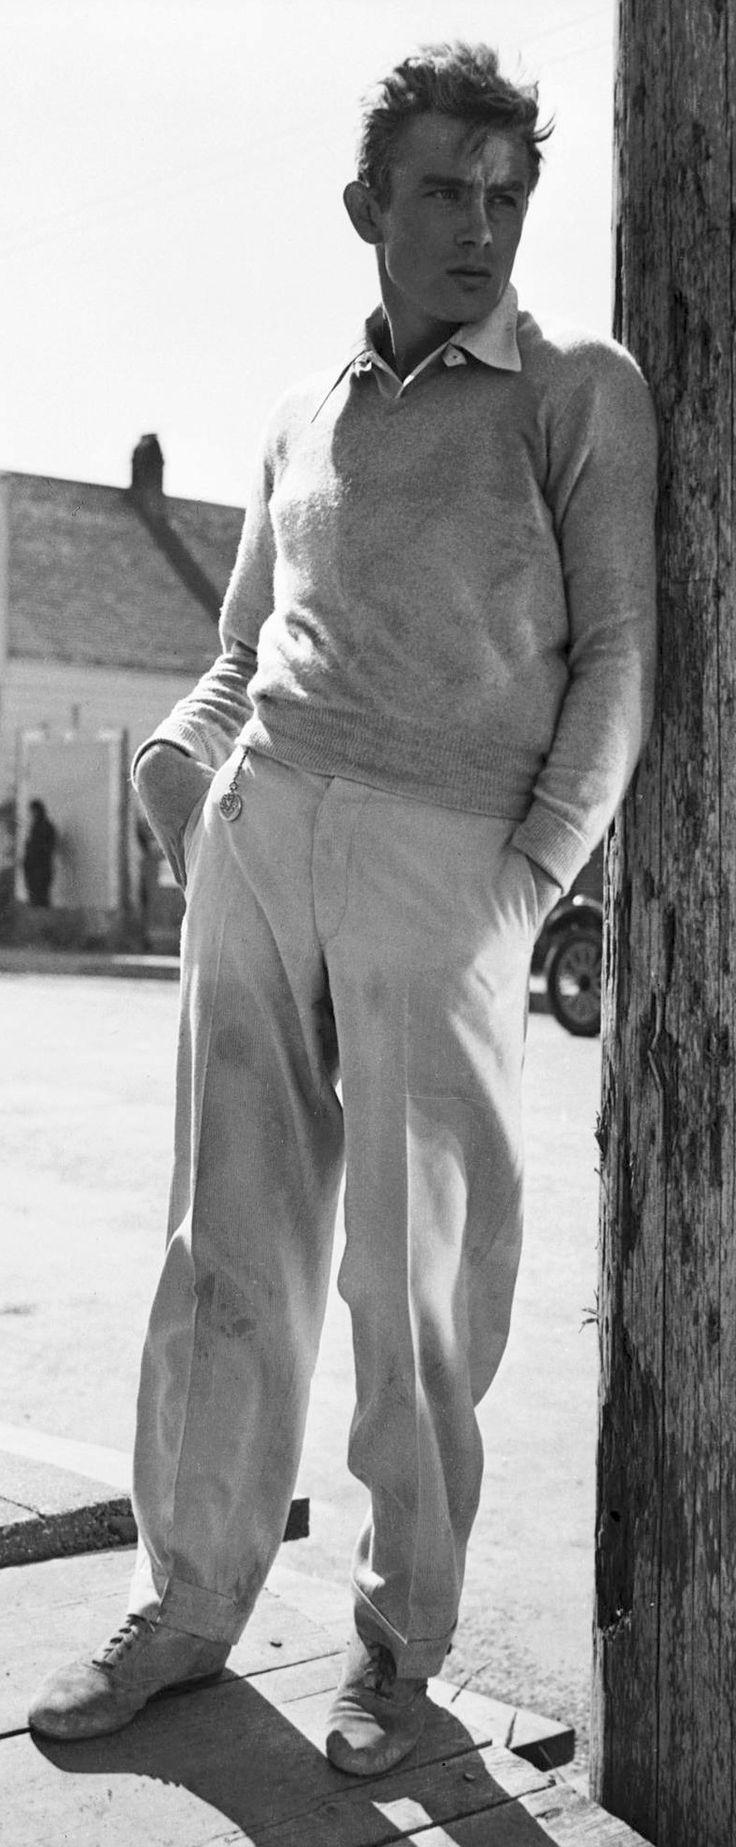 James Dean - East of Eden (Elia Kazan, 1955) www.buildfishinglures.com www.pennylure.com www.cashobo.com